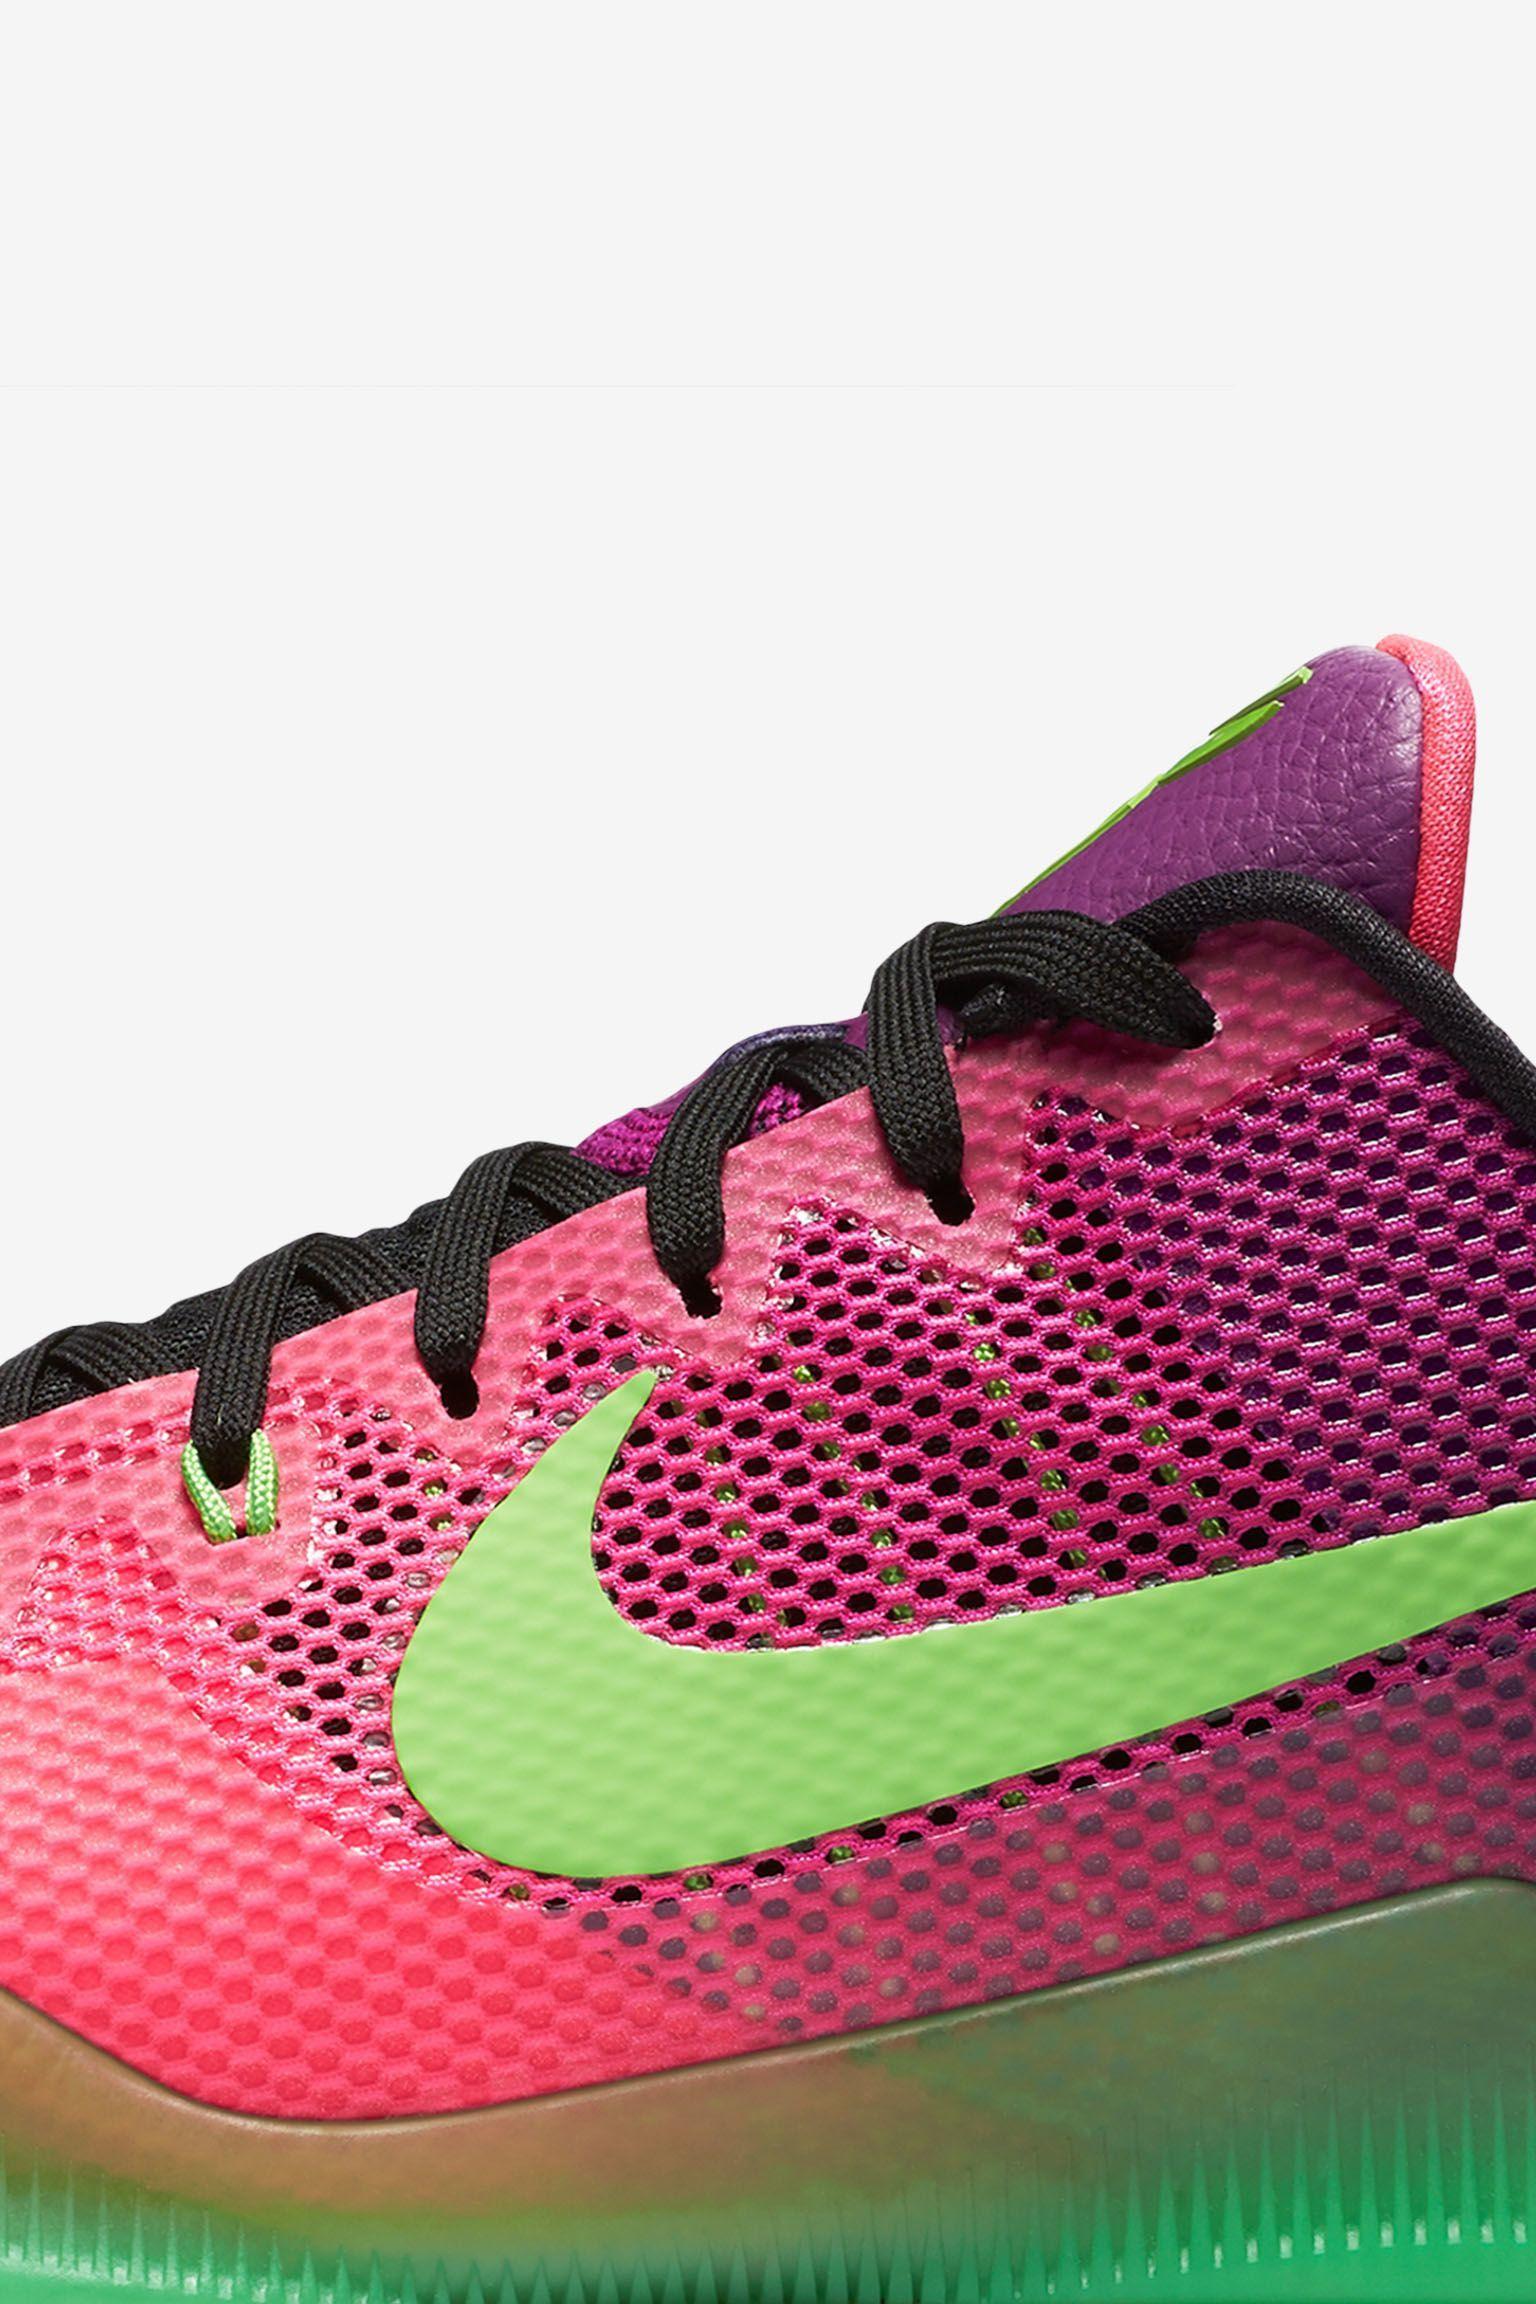 new arrival 6dc96 f43c4 Nike Kobe 11 Mambacurial  Pink Flash .